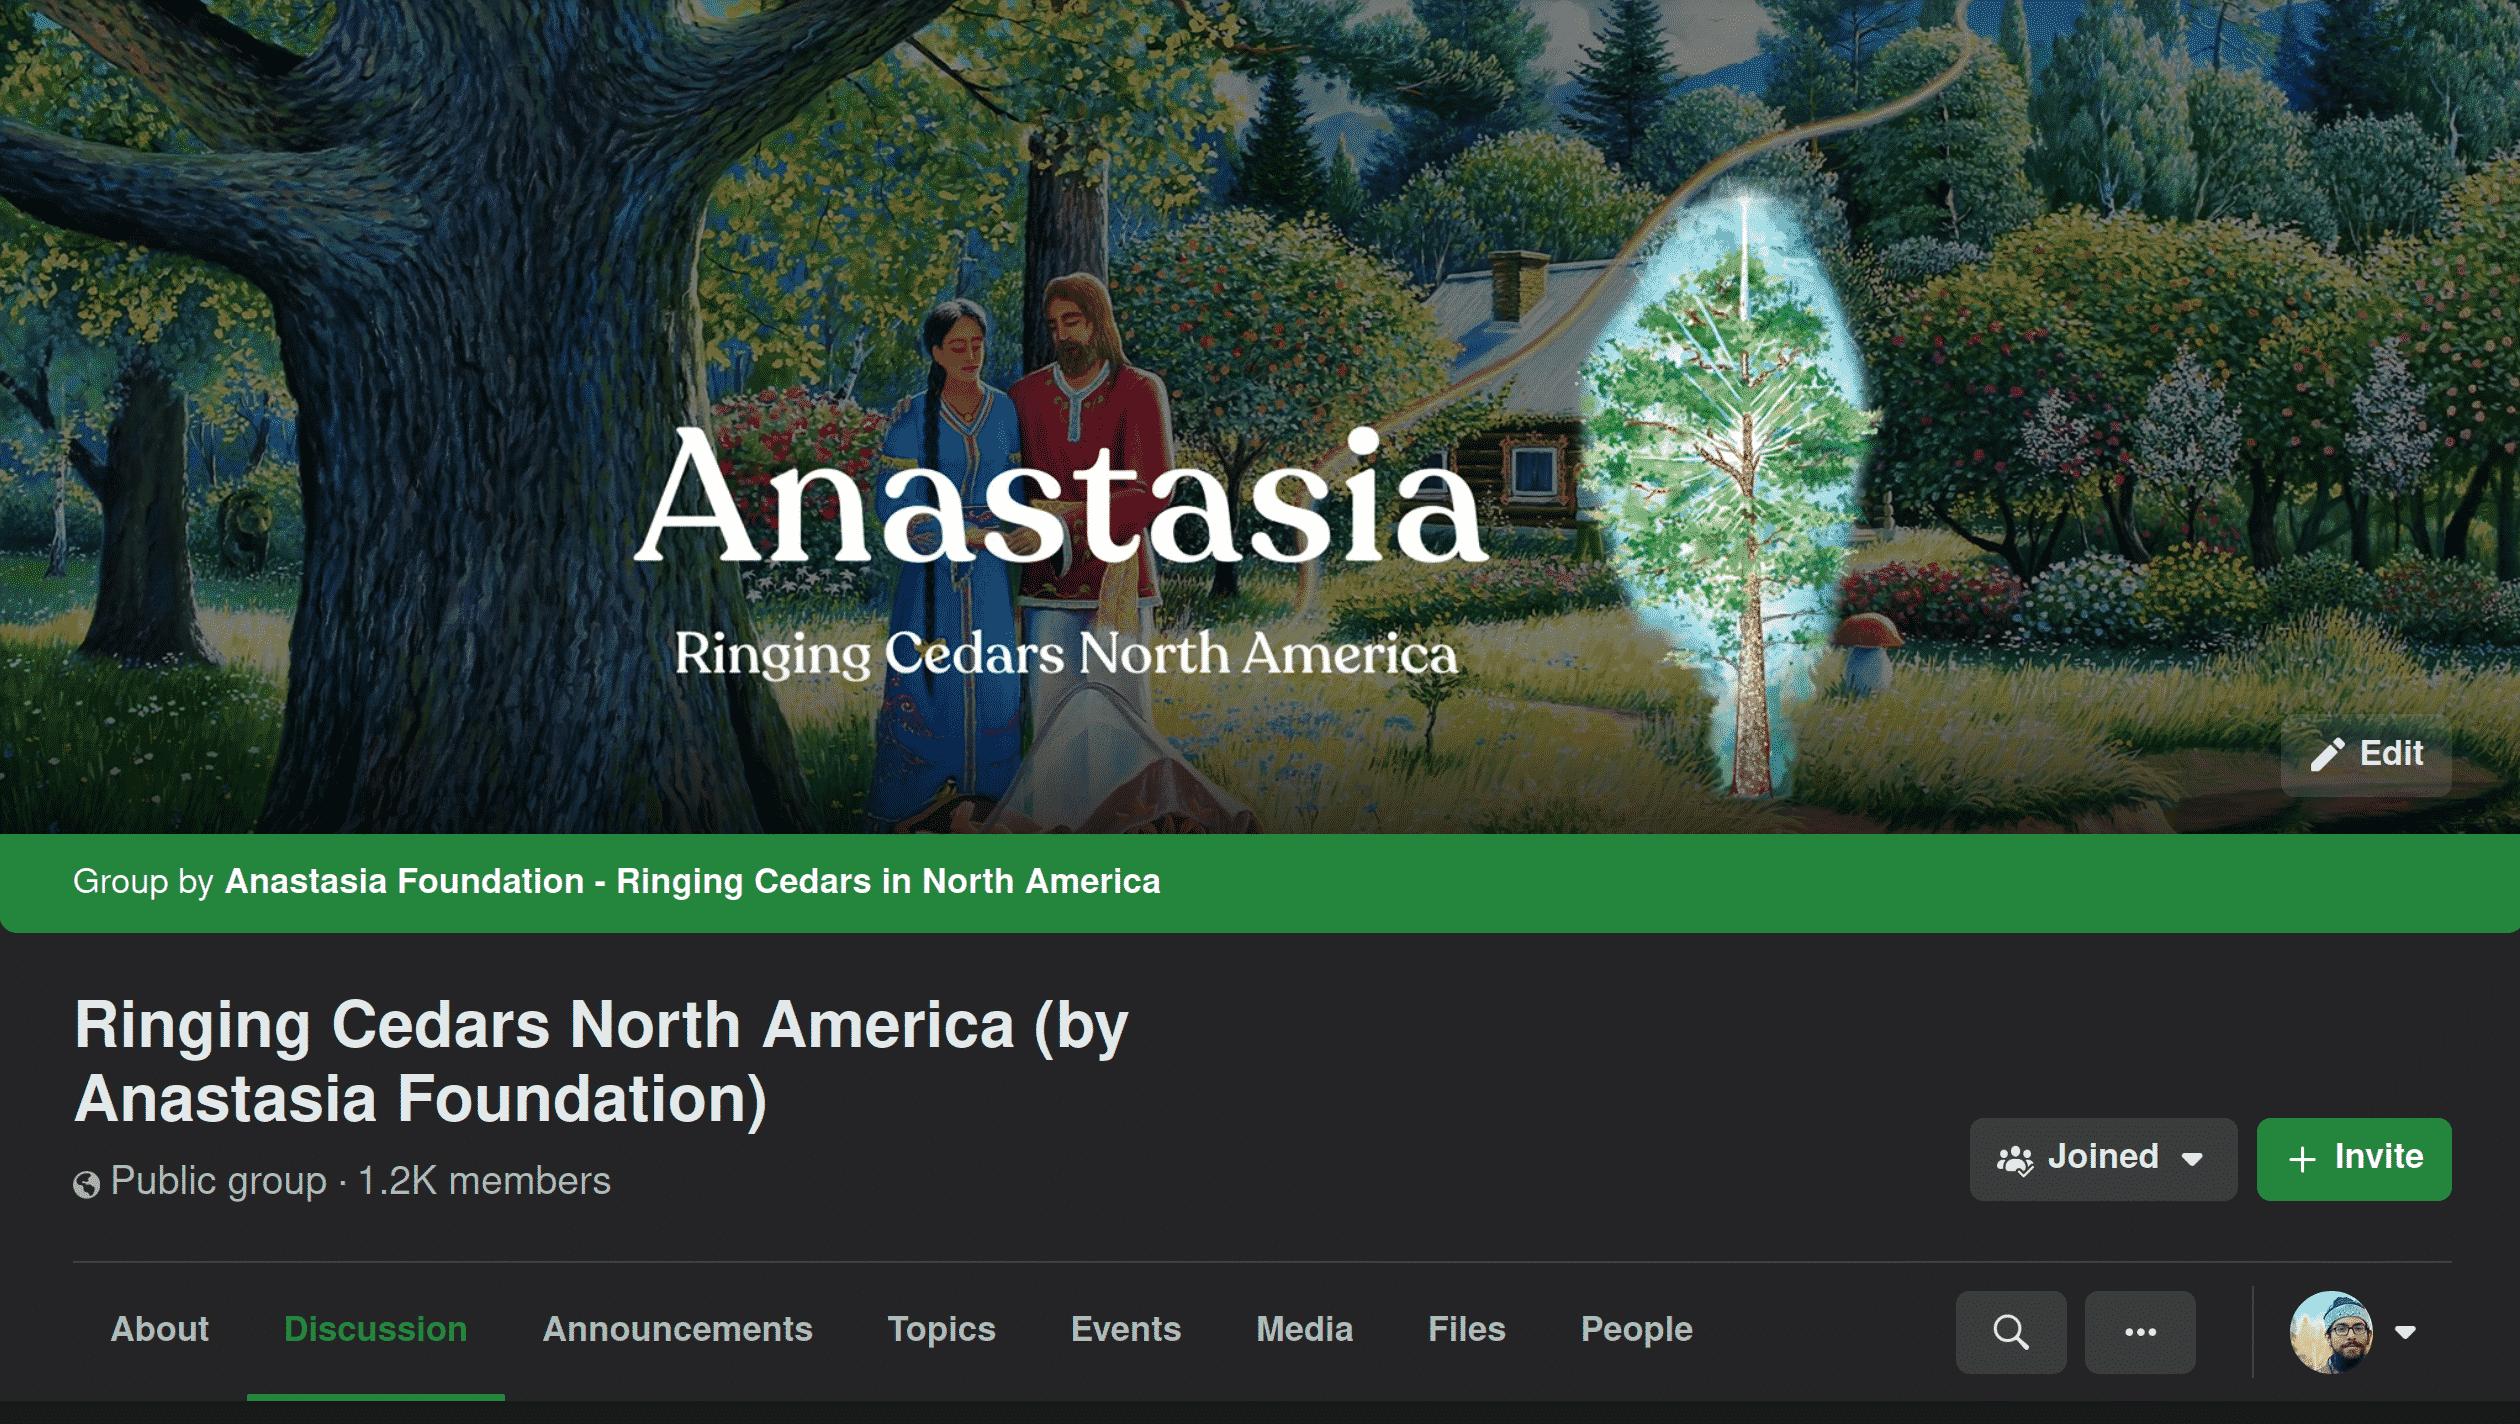 DeepinScreenshot select area 20210912210753 Ringing Cedars of Russia USA + Canada, Anastasia USA